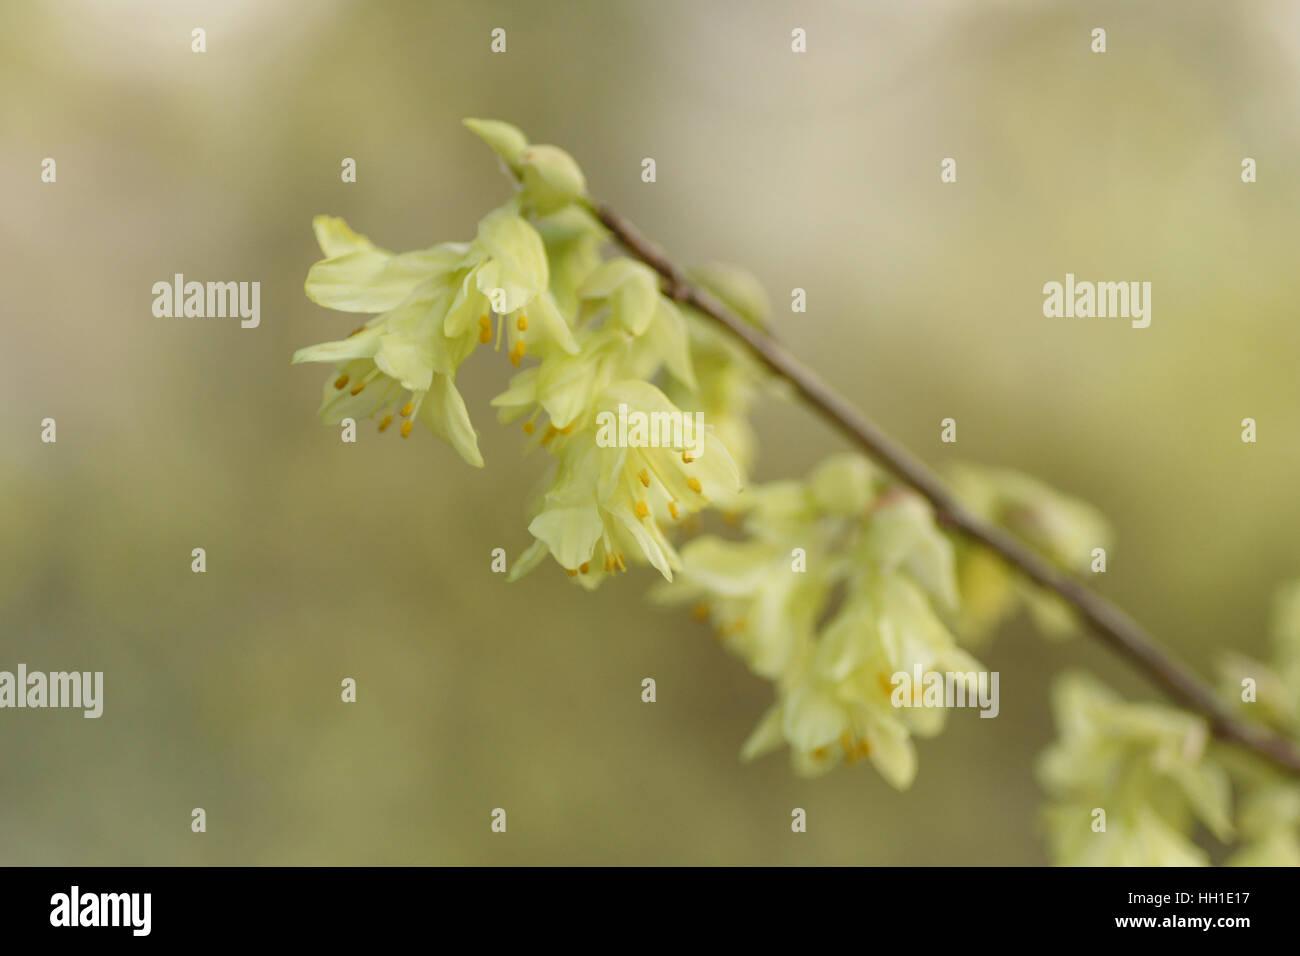 Corylopsis pauciflora - Stock Image